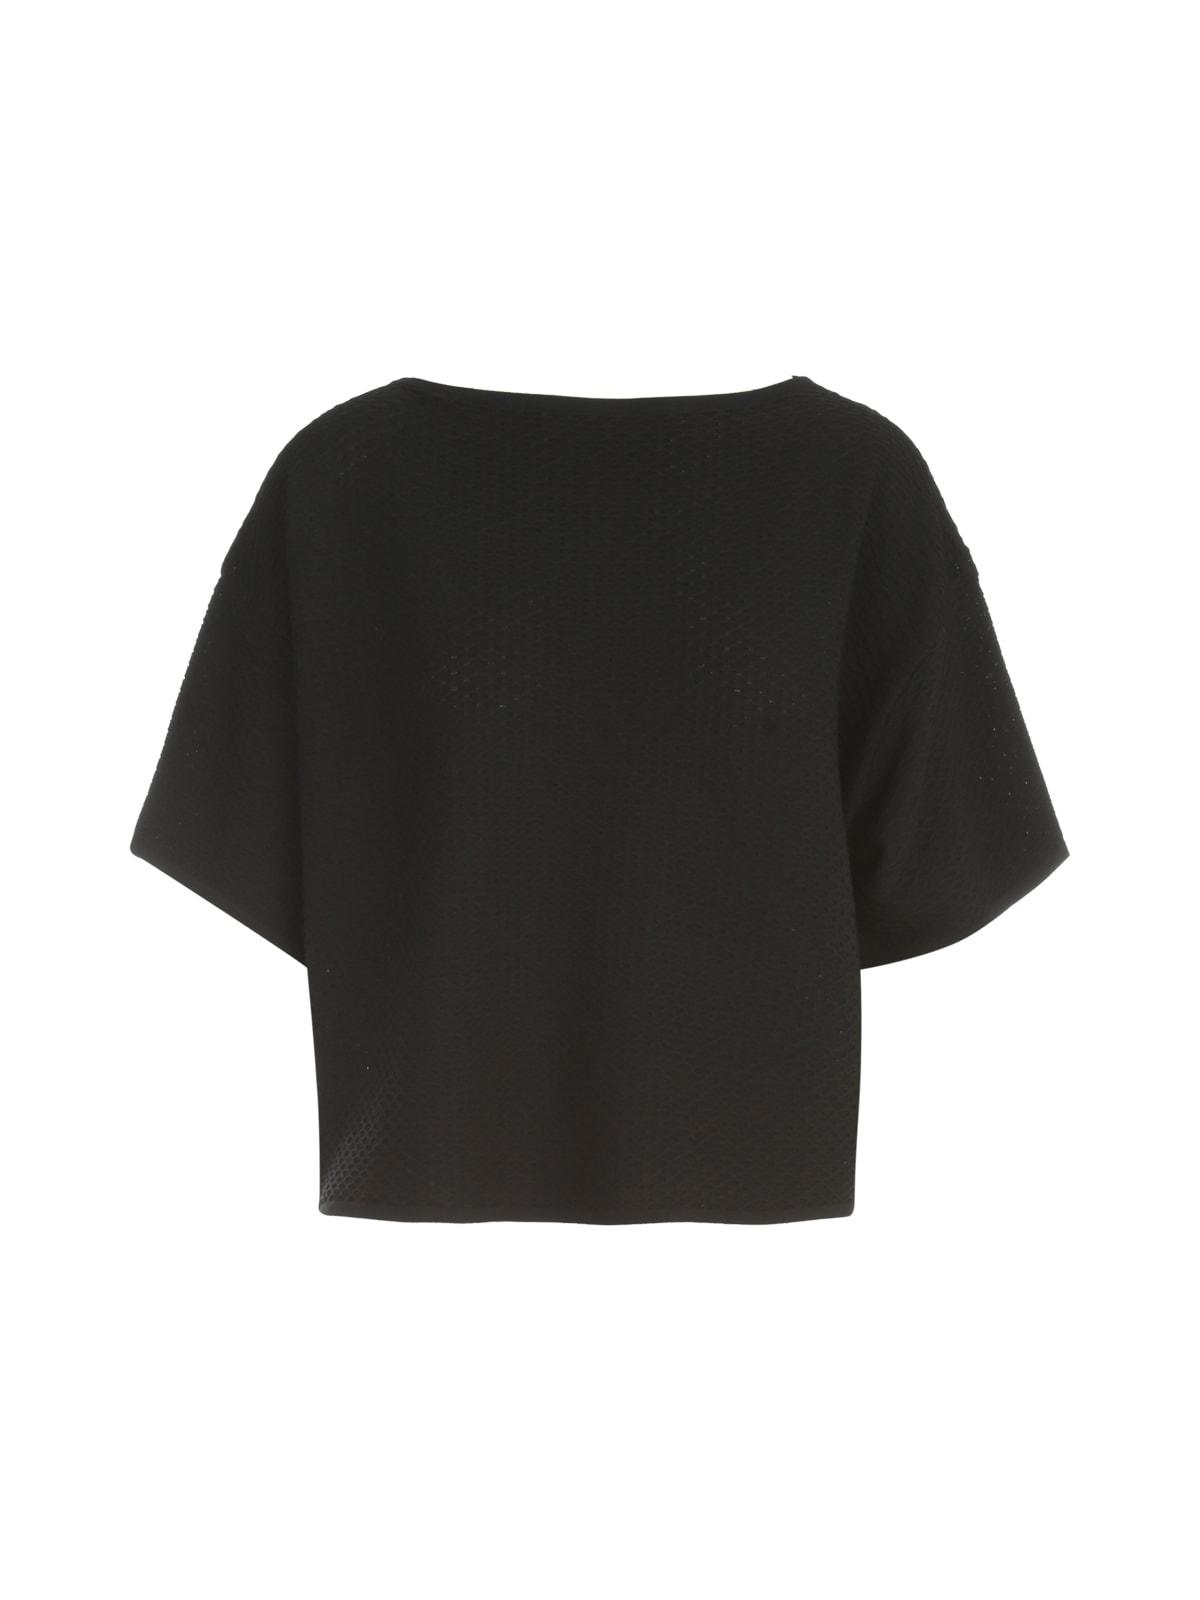 S/s Sweater